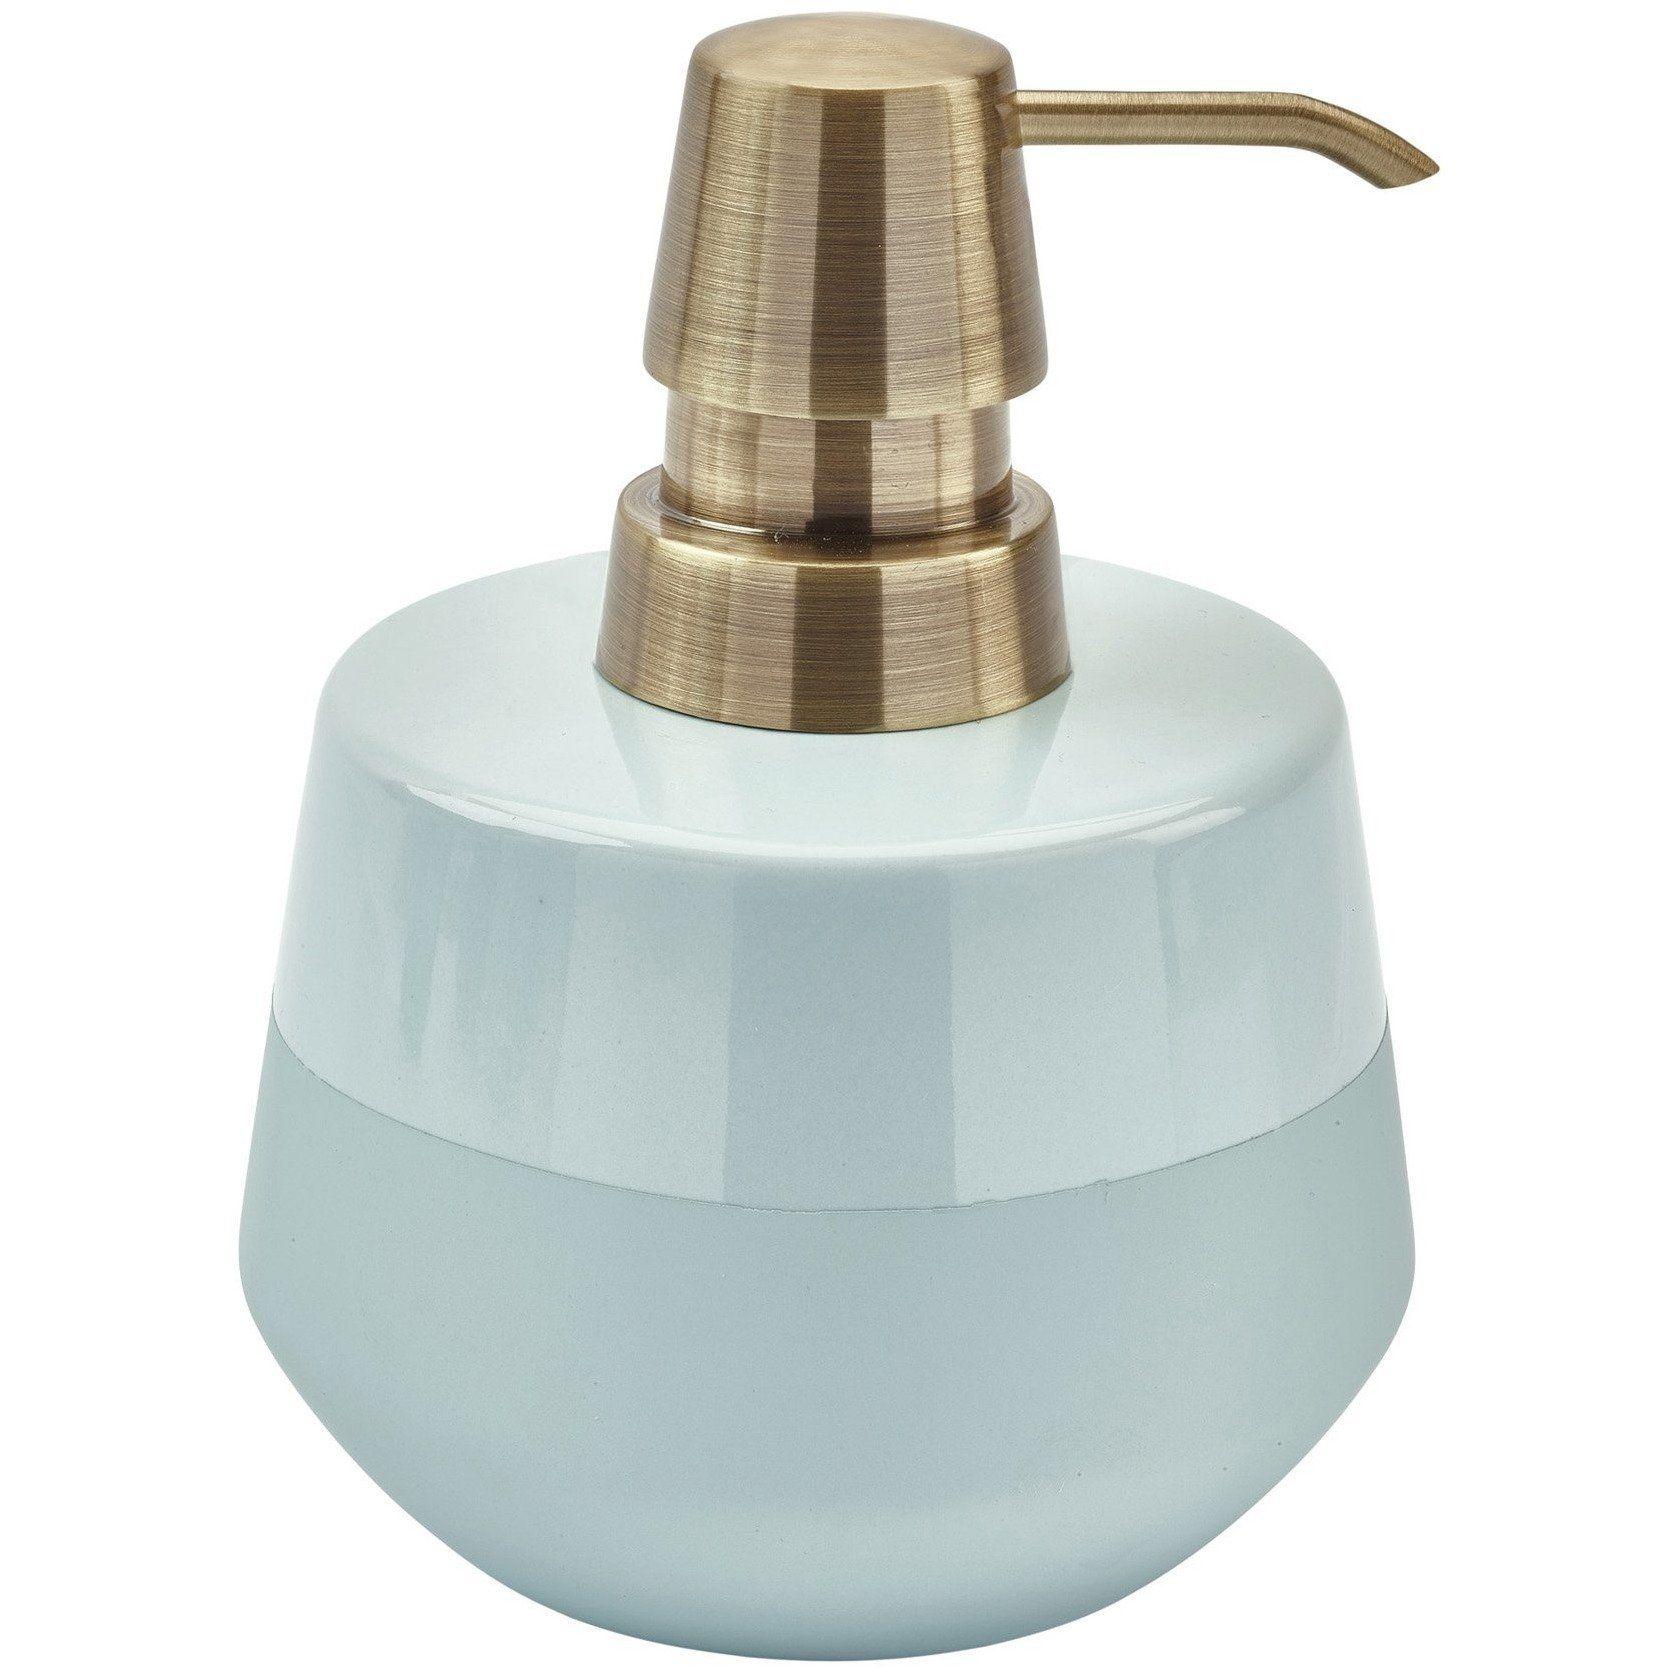 Opaco Compact Round Bath or Kitchen Pump Liquid Soap Lotion ...